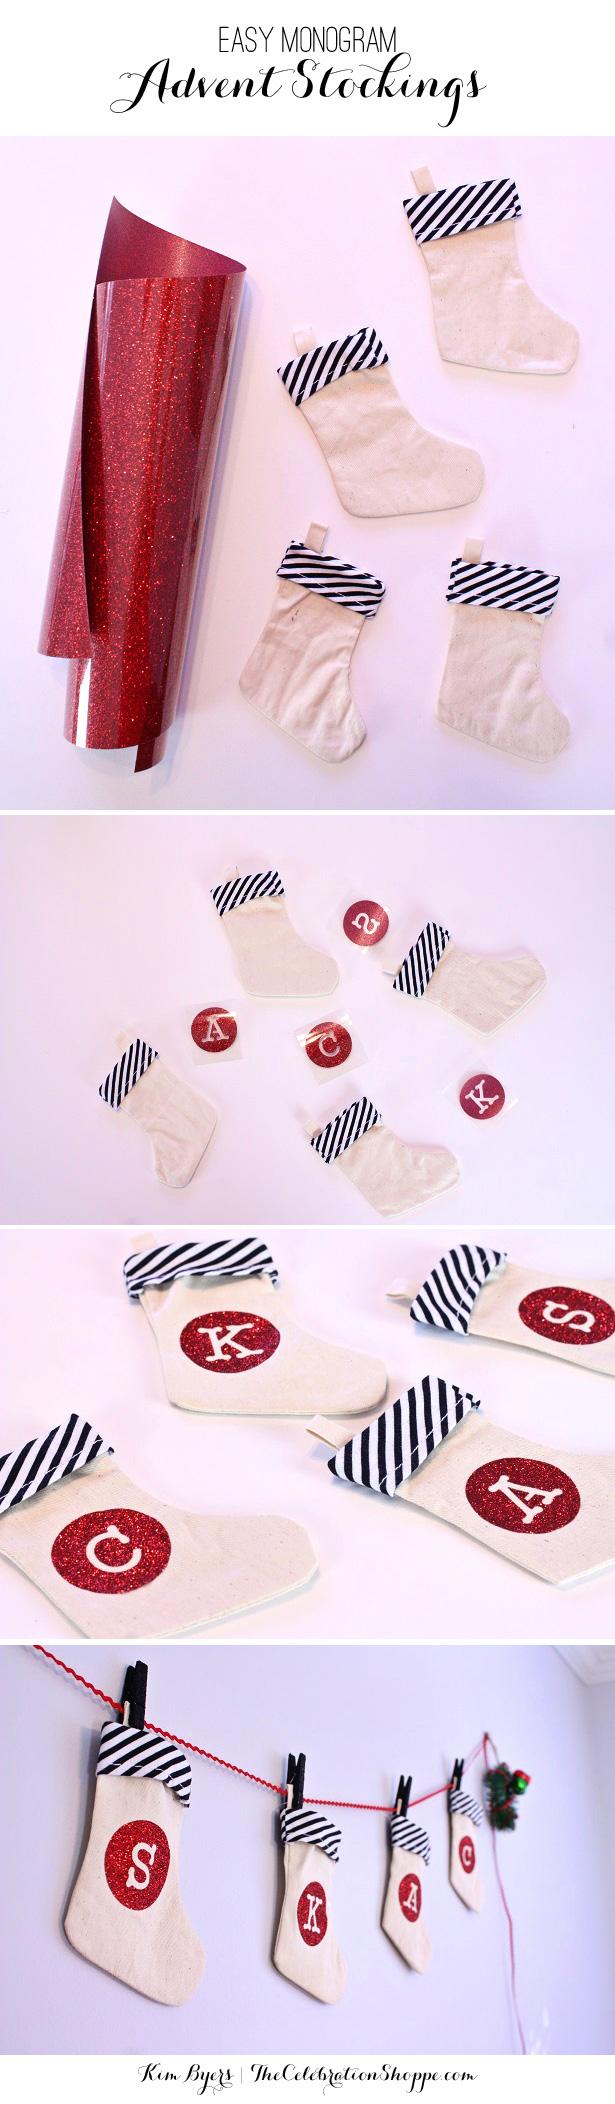 DIY Monogram Advent Stockings   Kim Byers